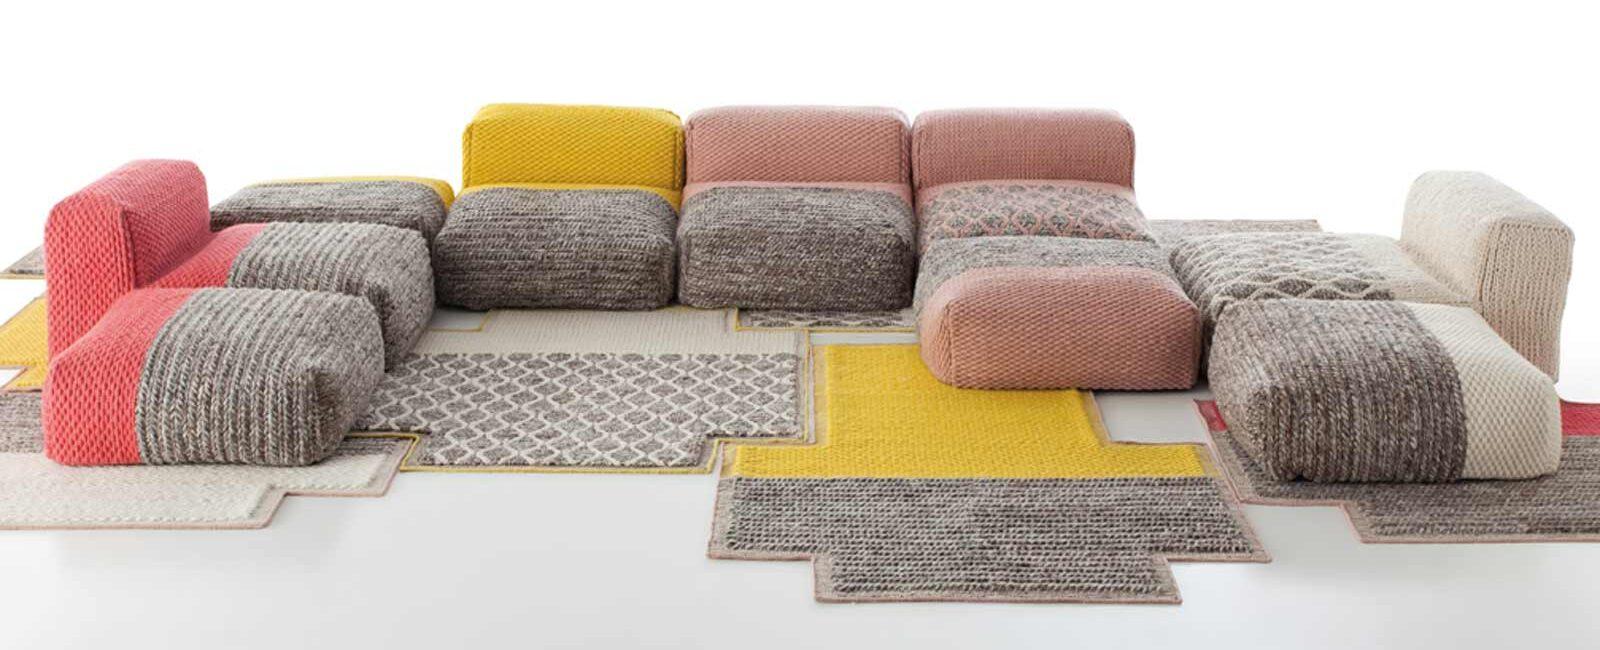 Modular sofas: a versatile and comfortable furnishing